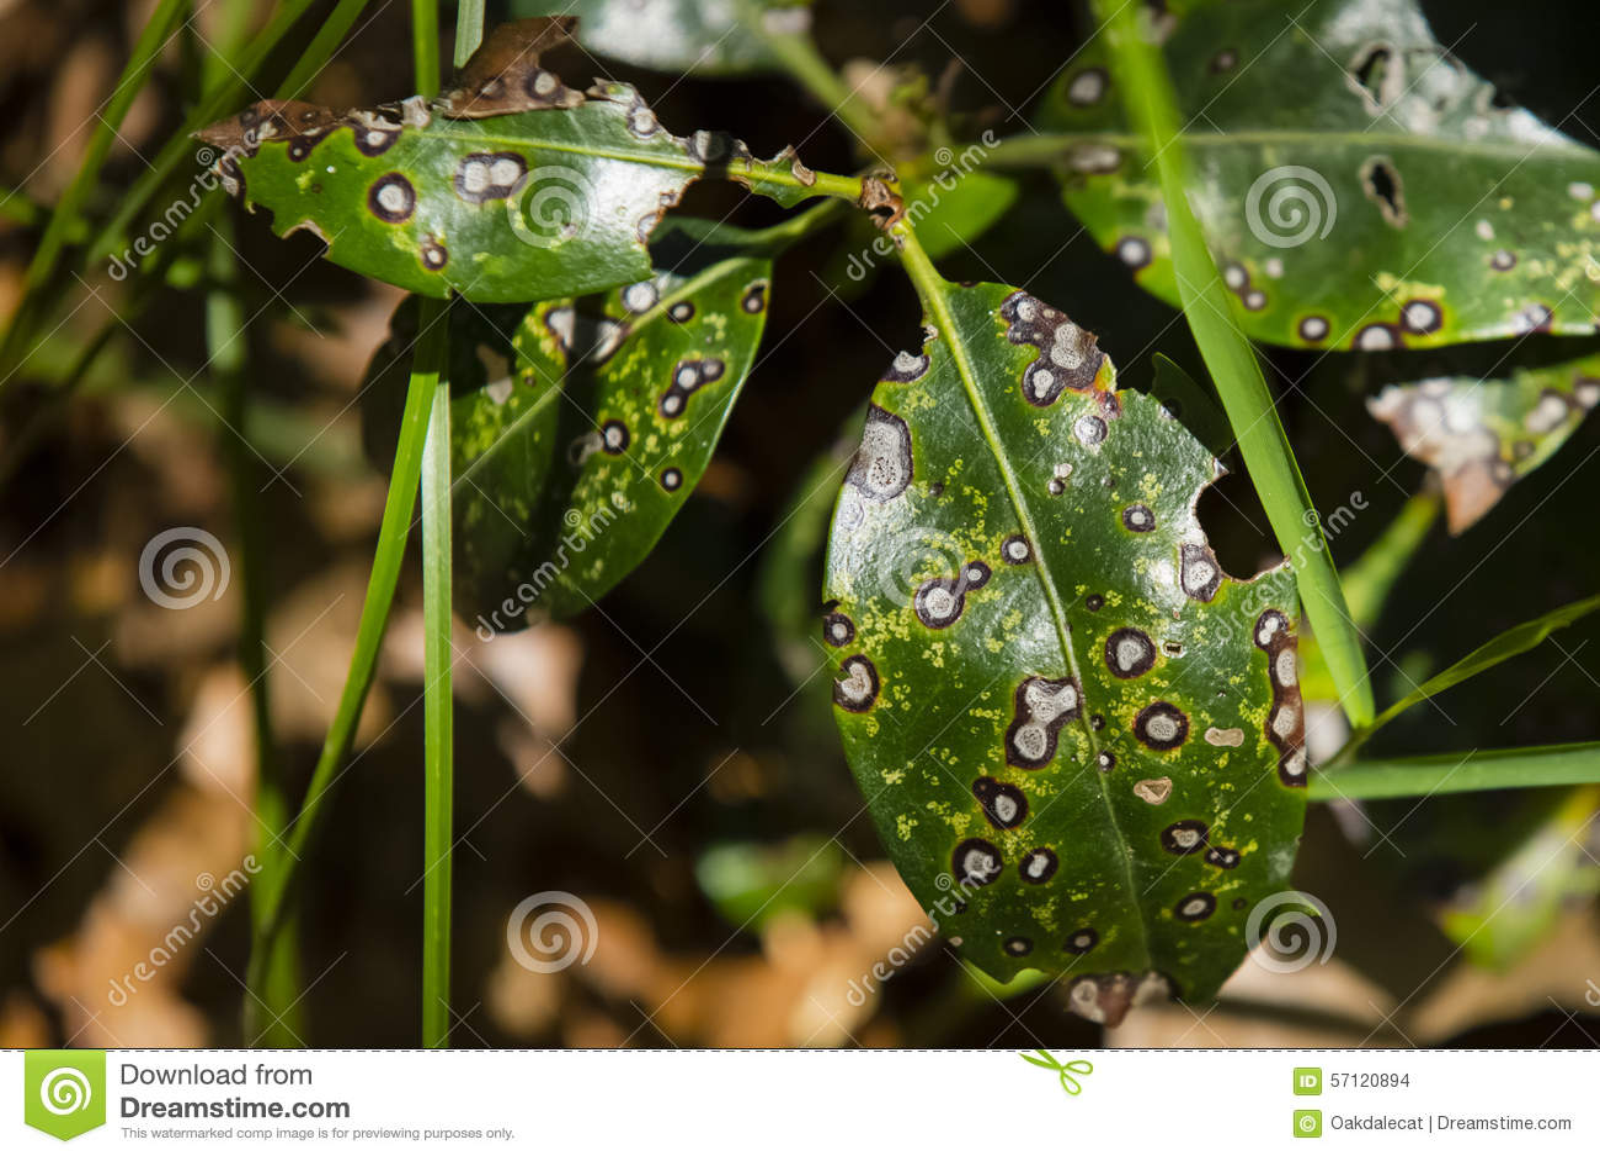 Septoria Leaf Spot/Leaf Rust Stock Photo - Image of sickness